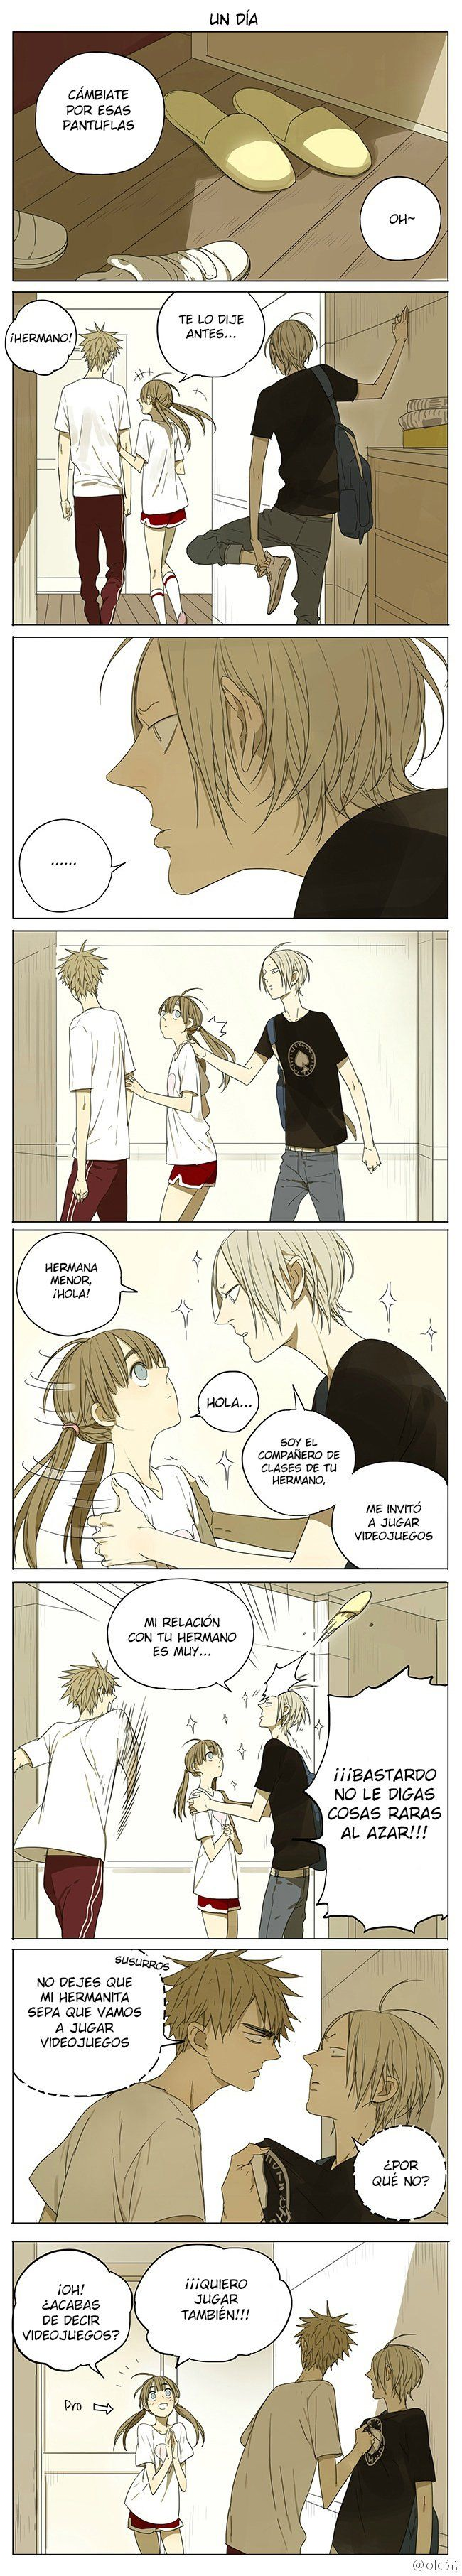 19 Days Capítulo 4 página 2 (Cargar imágenes: 10) - Leer Manga en Español gratis en NineManga.com